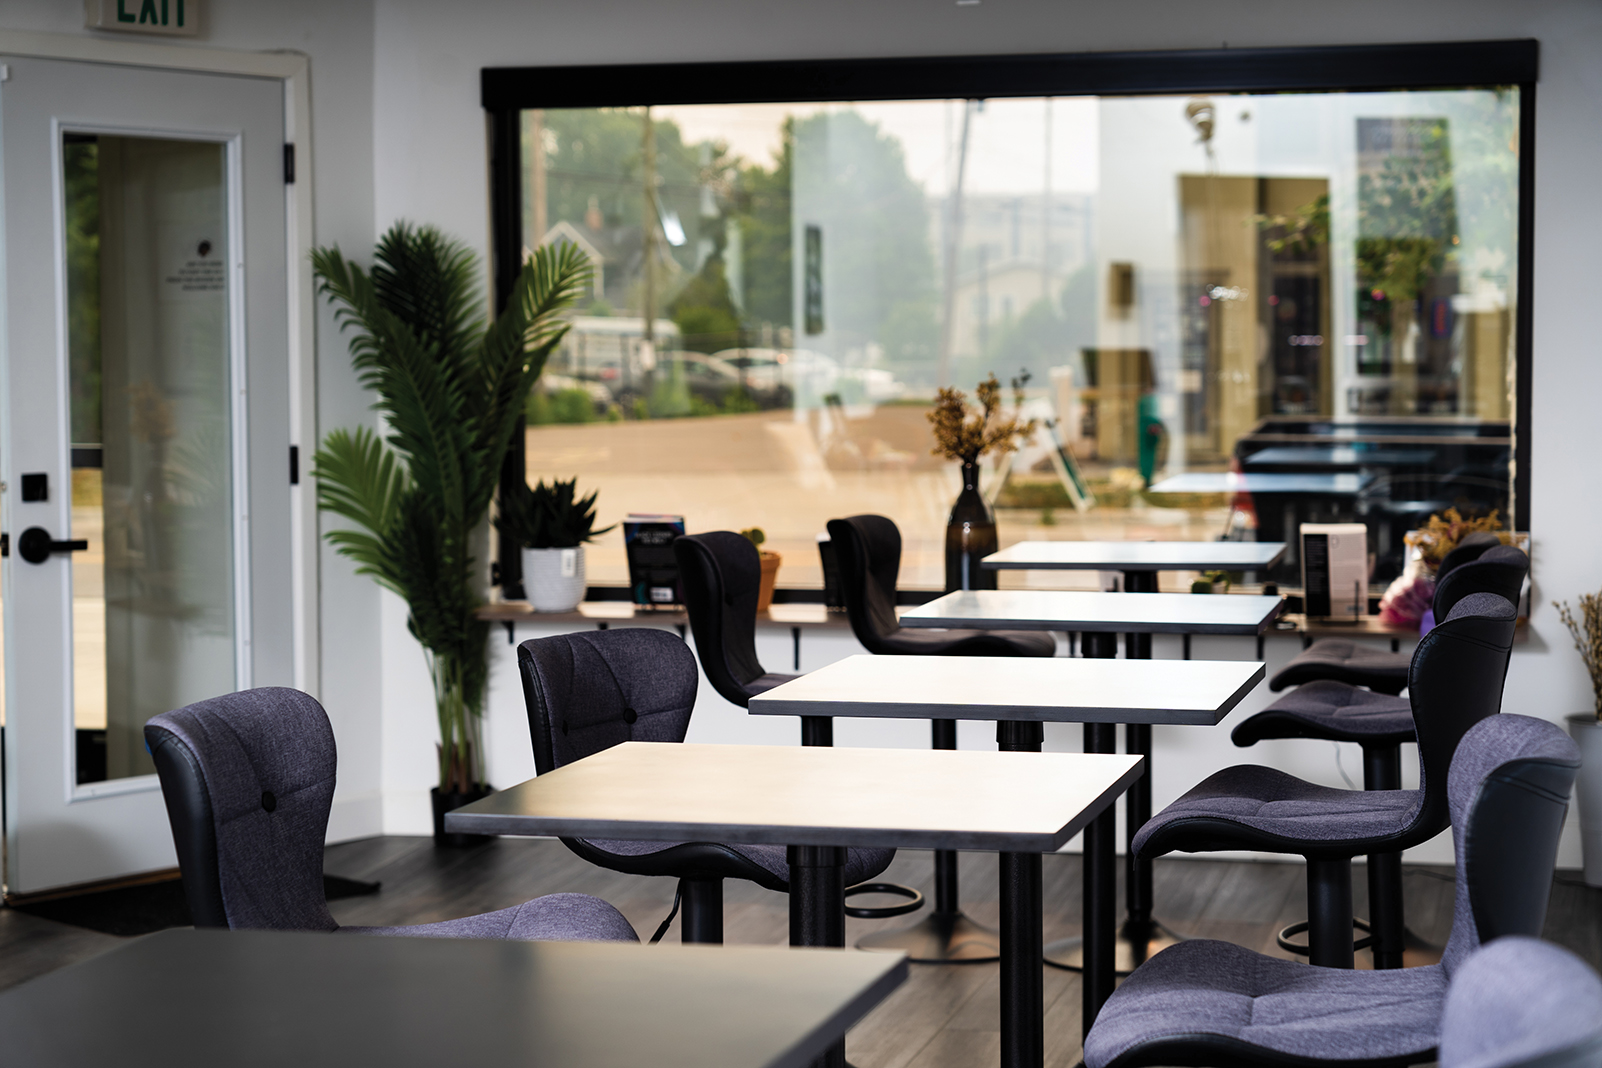 Black Table Arts' café-style room